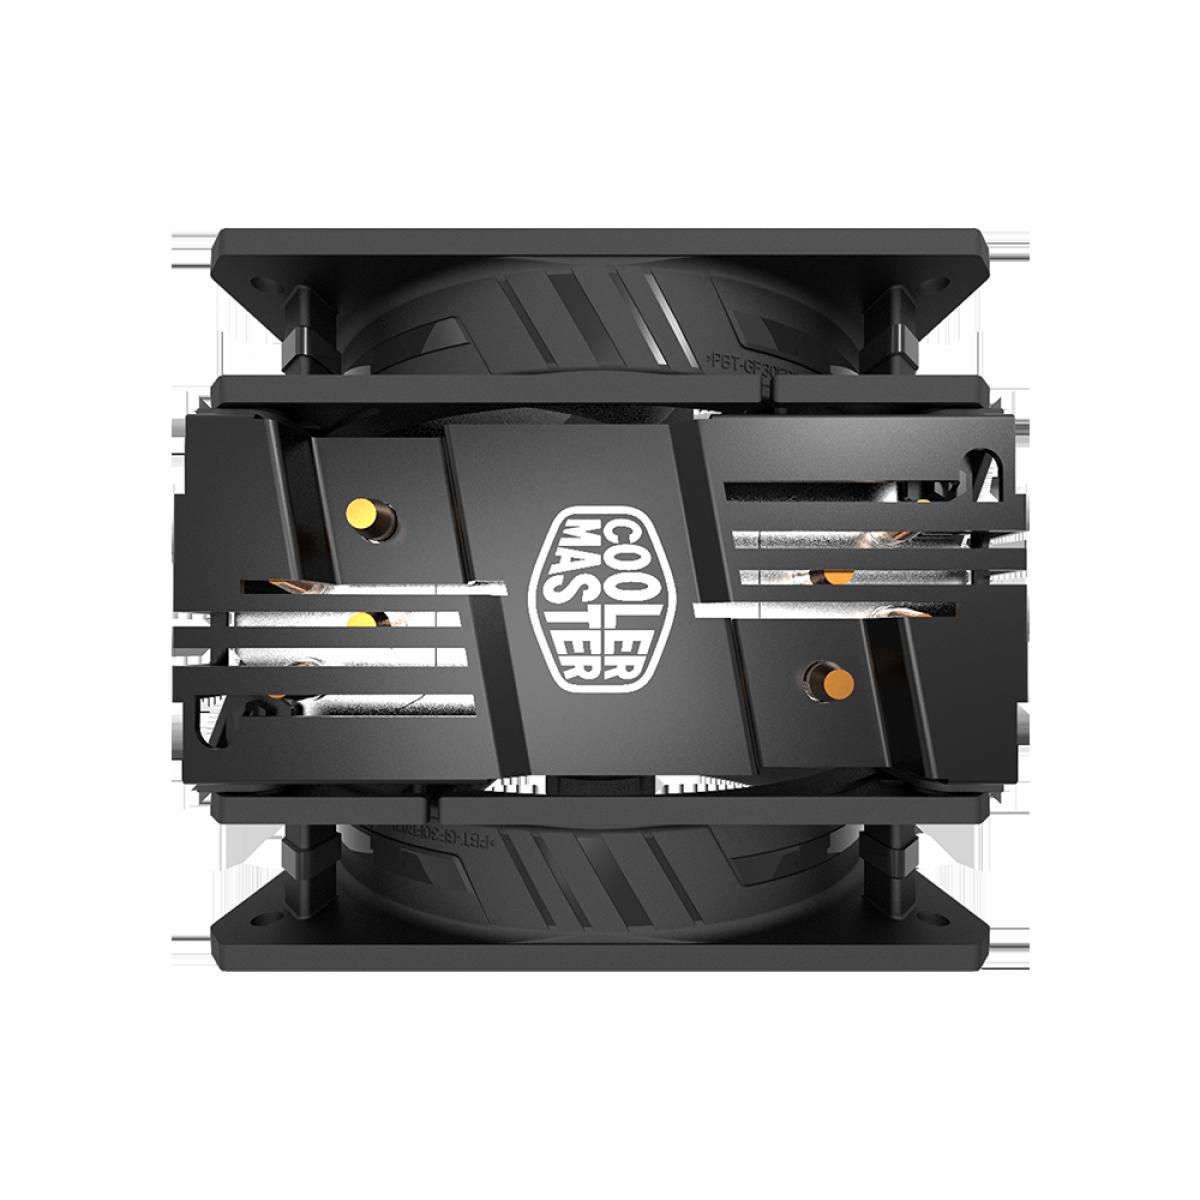 Cooler para Processador Cooler Master Hyper 212 Turbo ARGB 120mm, Intel-AMD, RR-212TK-18PA-R1